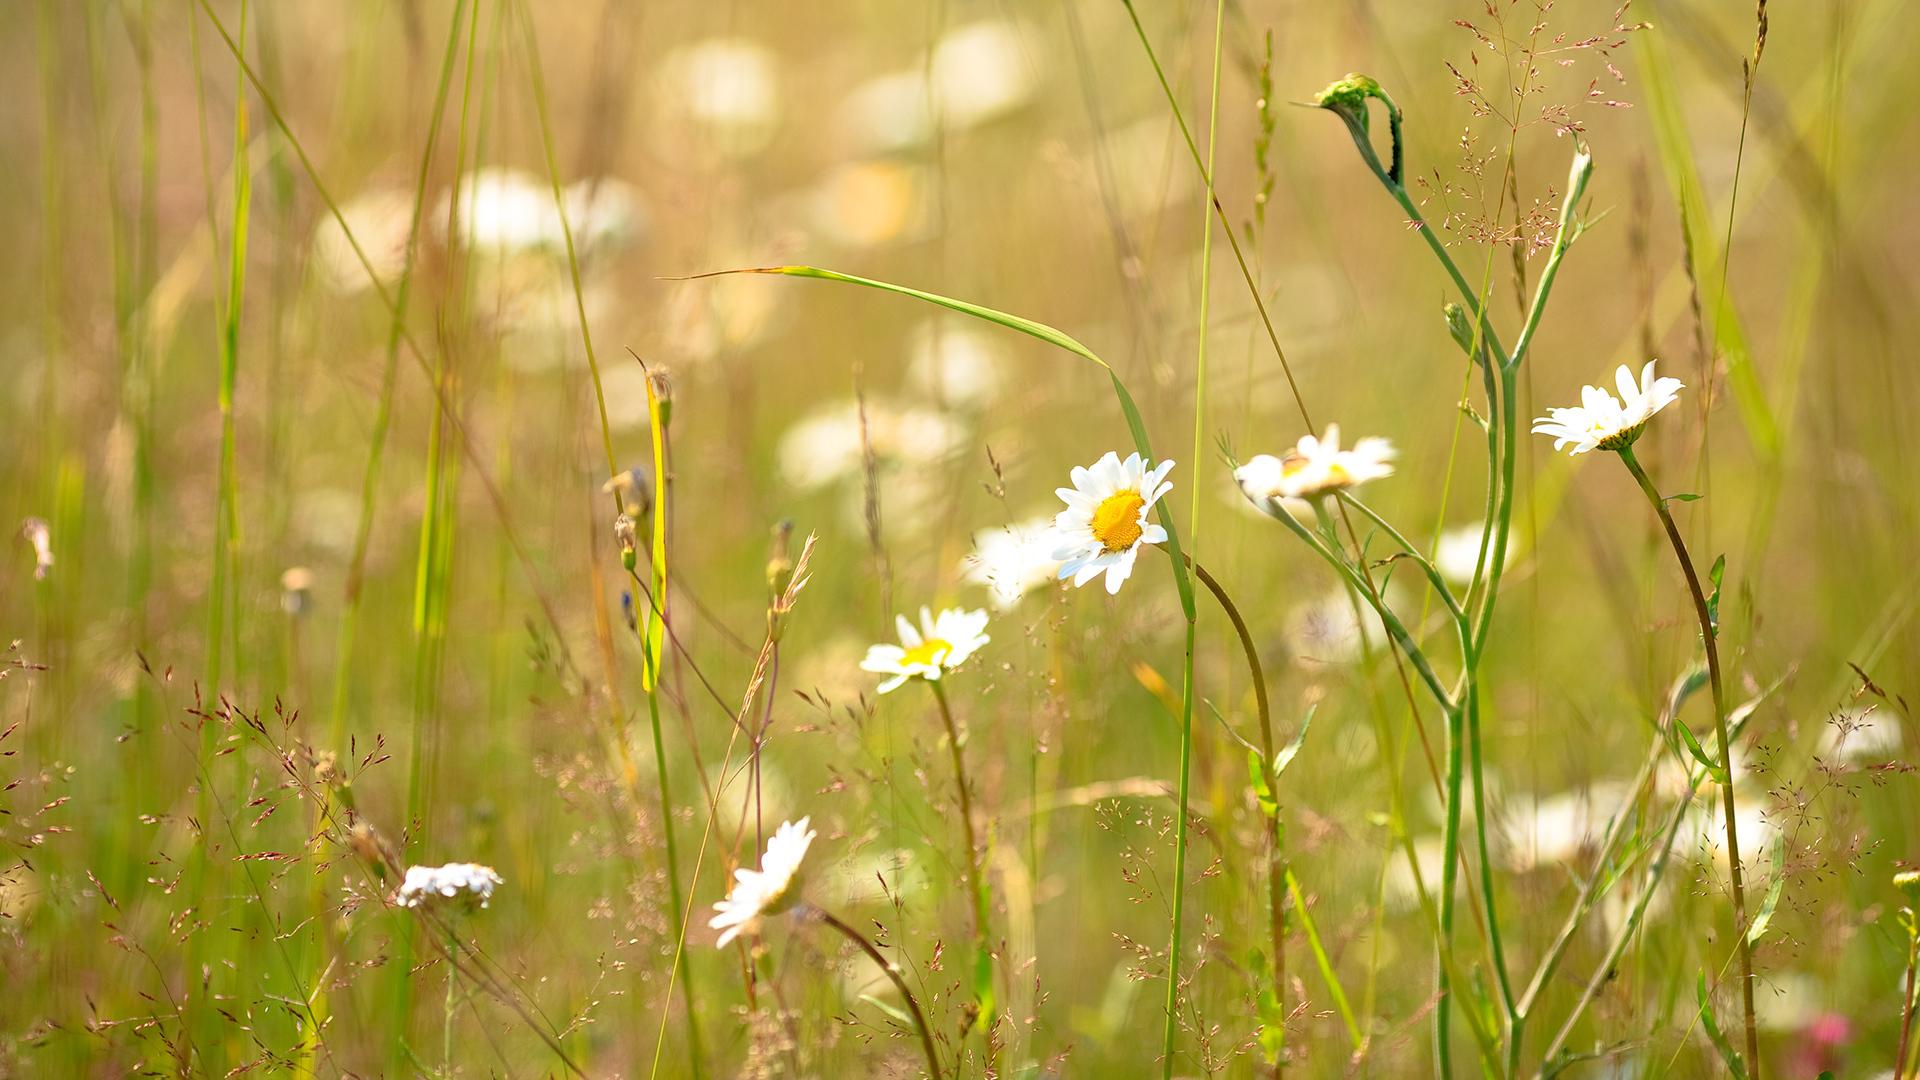 ромашки цветы трава природа подборки